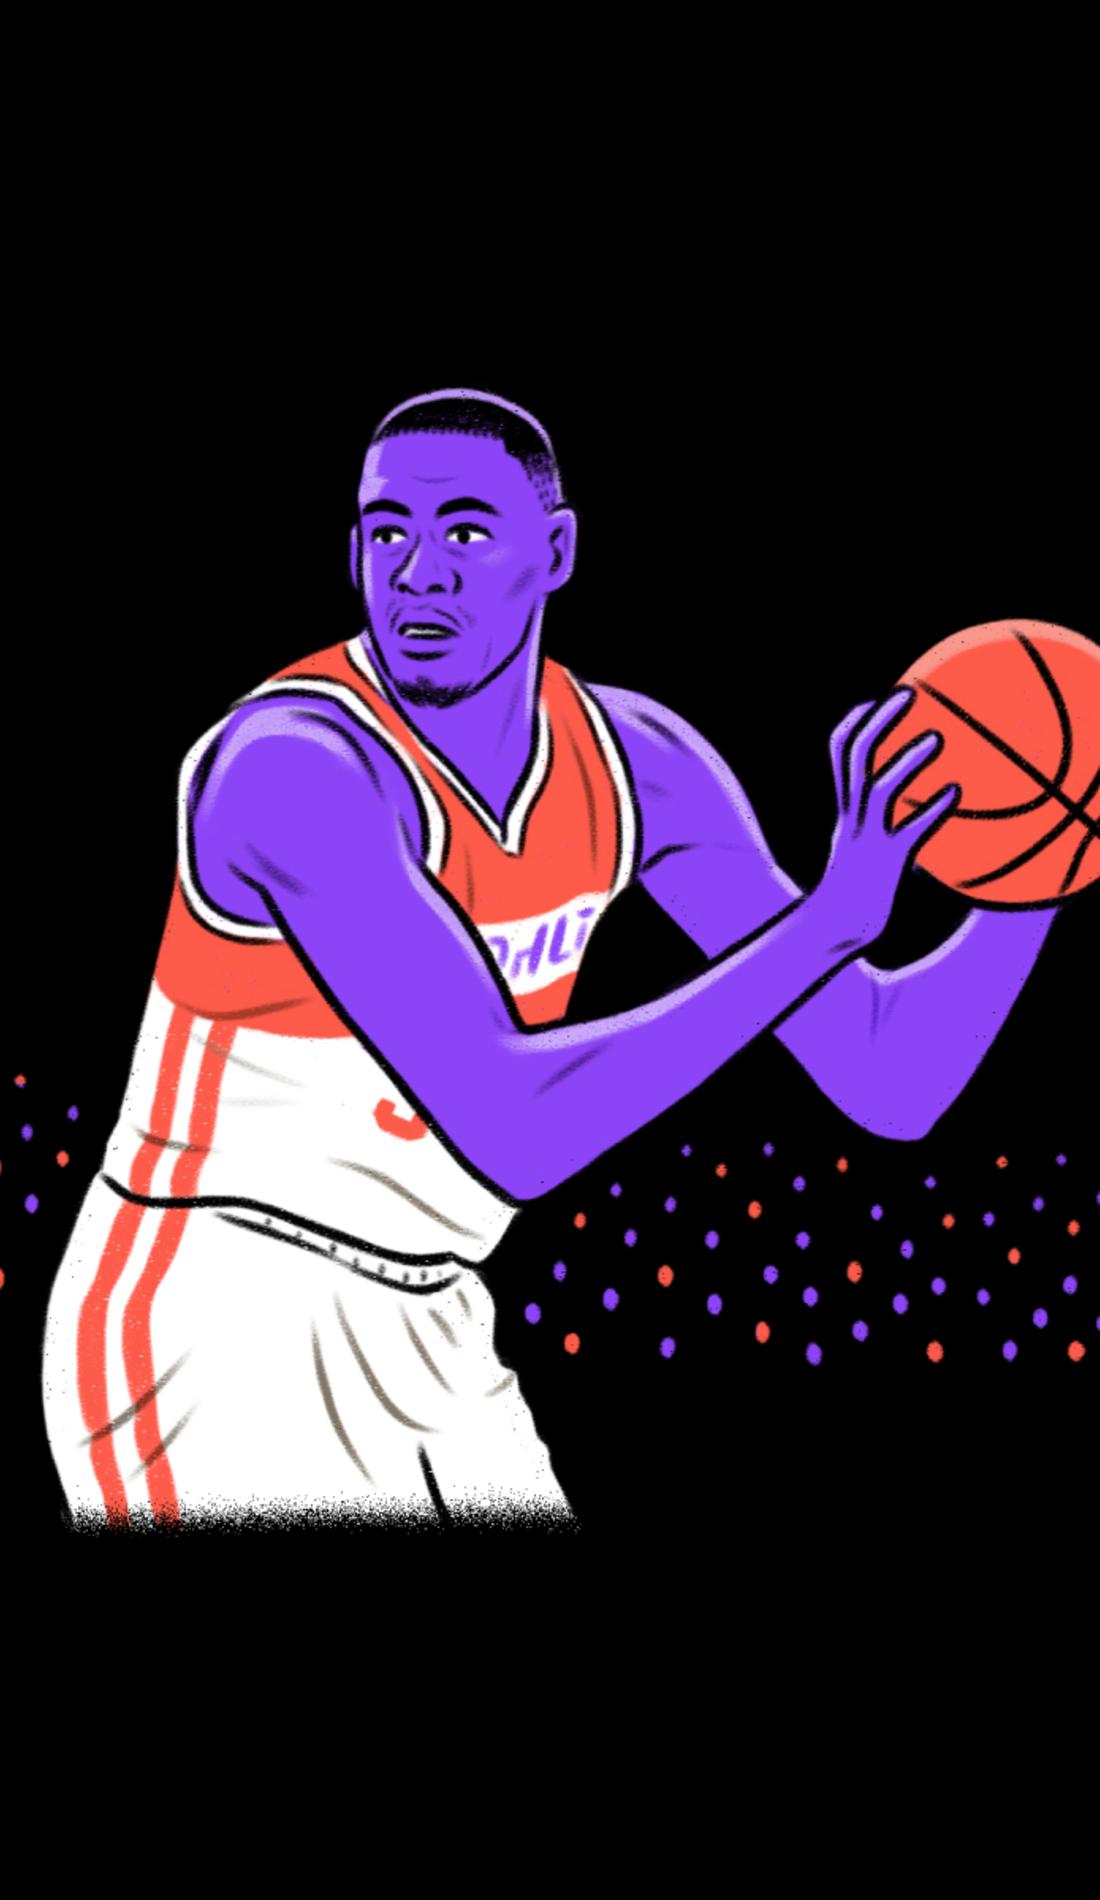 A Big 12 Men's Basketball Tournament live event